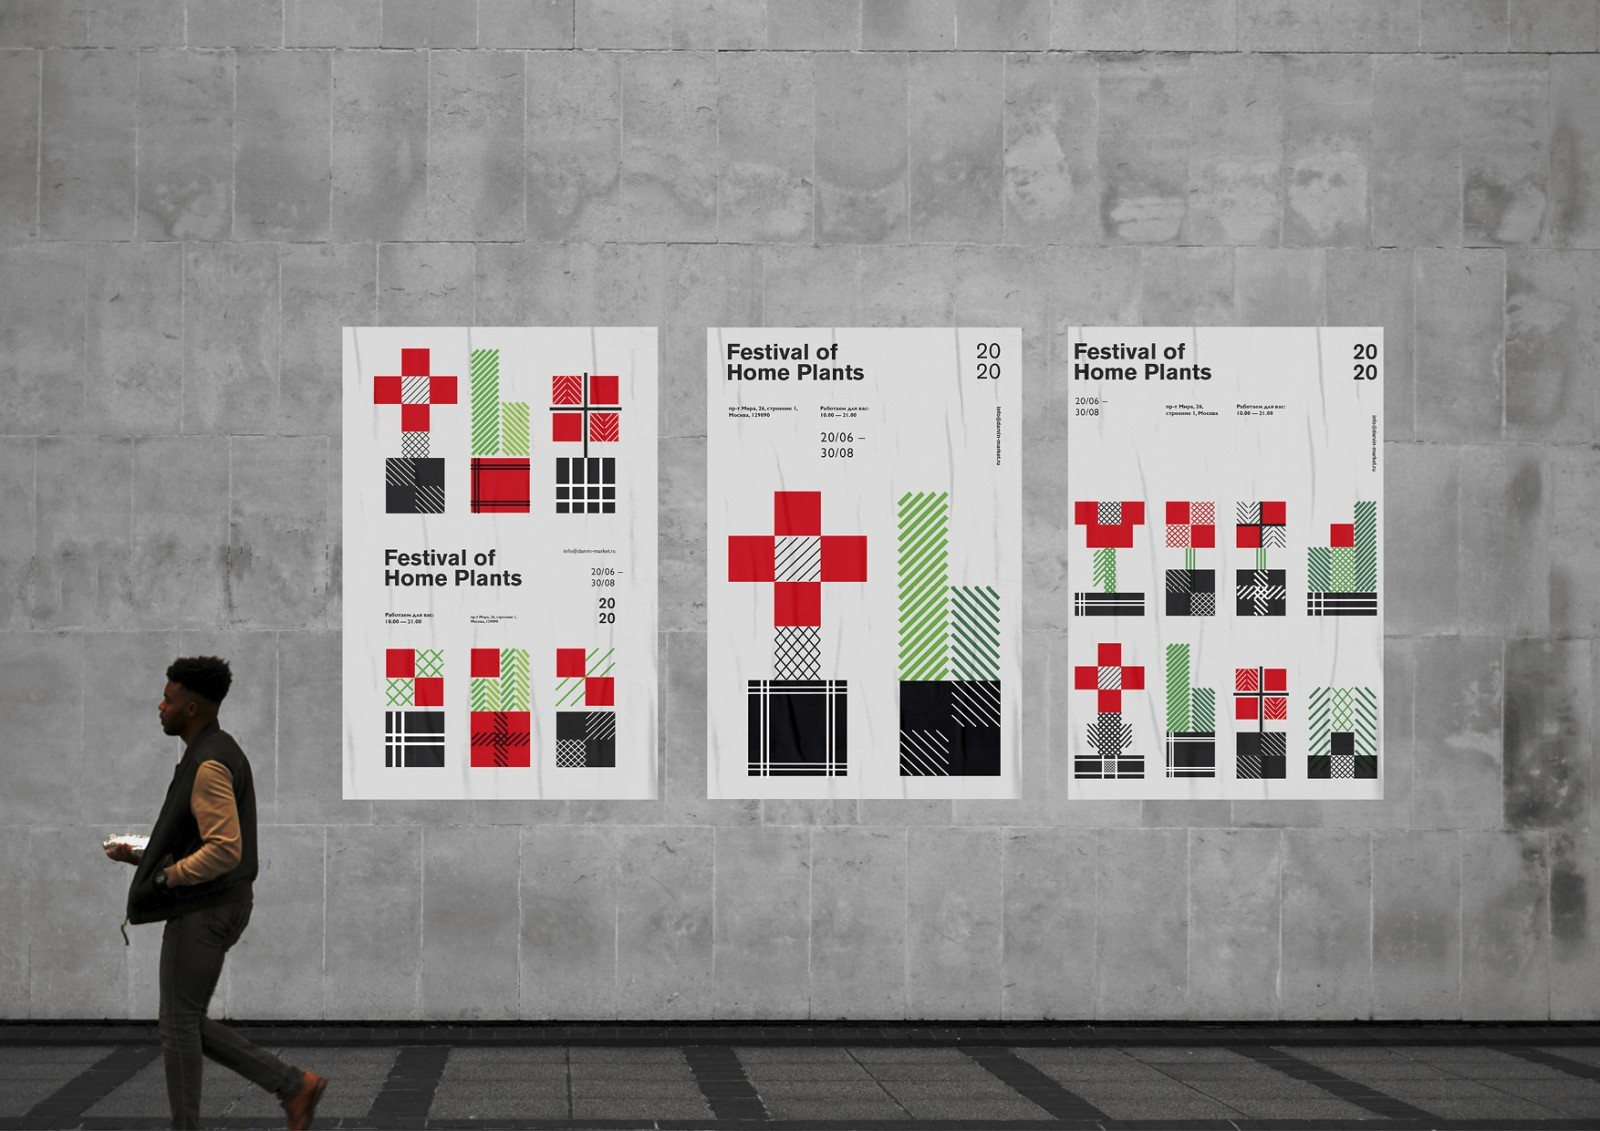 Student Brand Design Concept for Festival of Home Plants